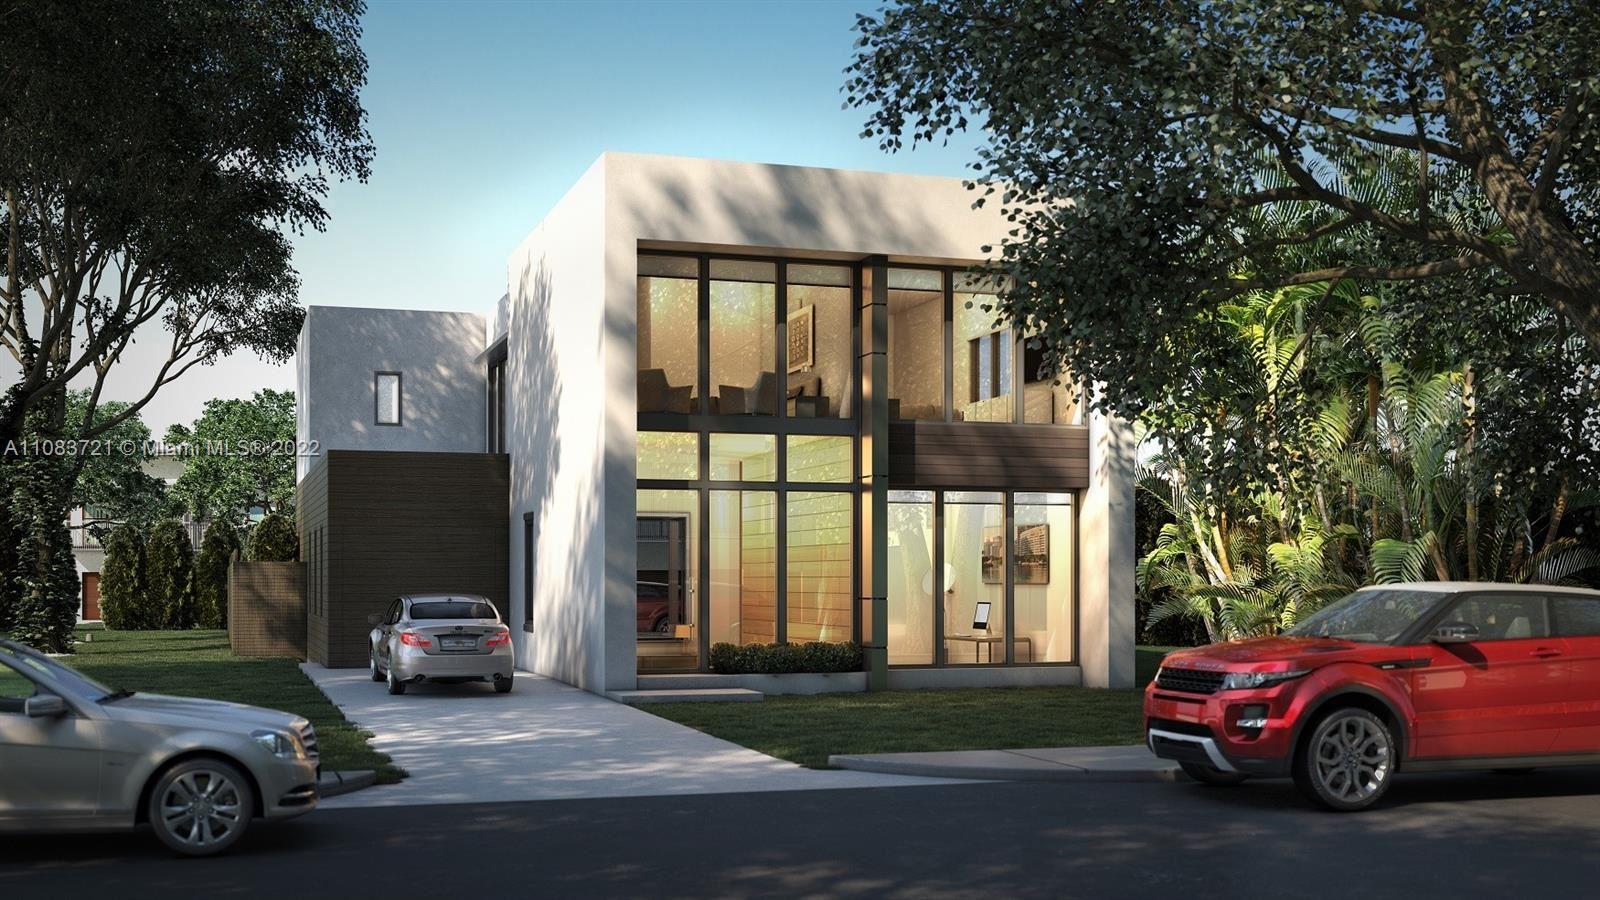 3780 Loquat Ave, Miami, FL 33133 - #: A11083721